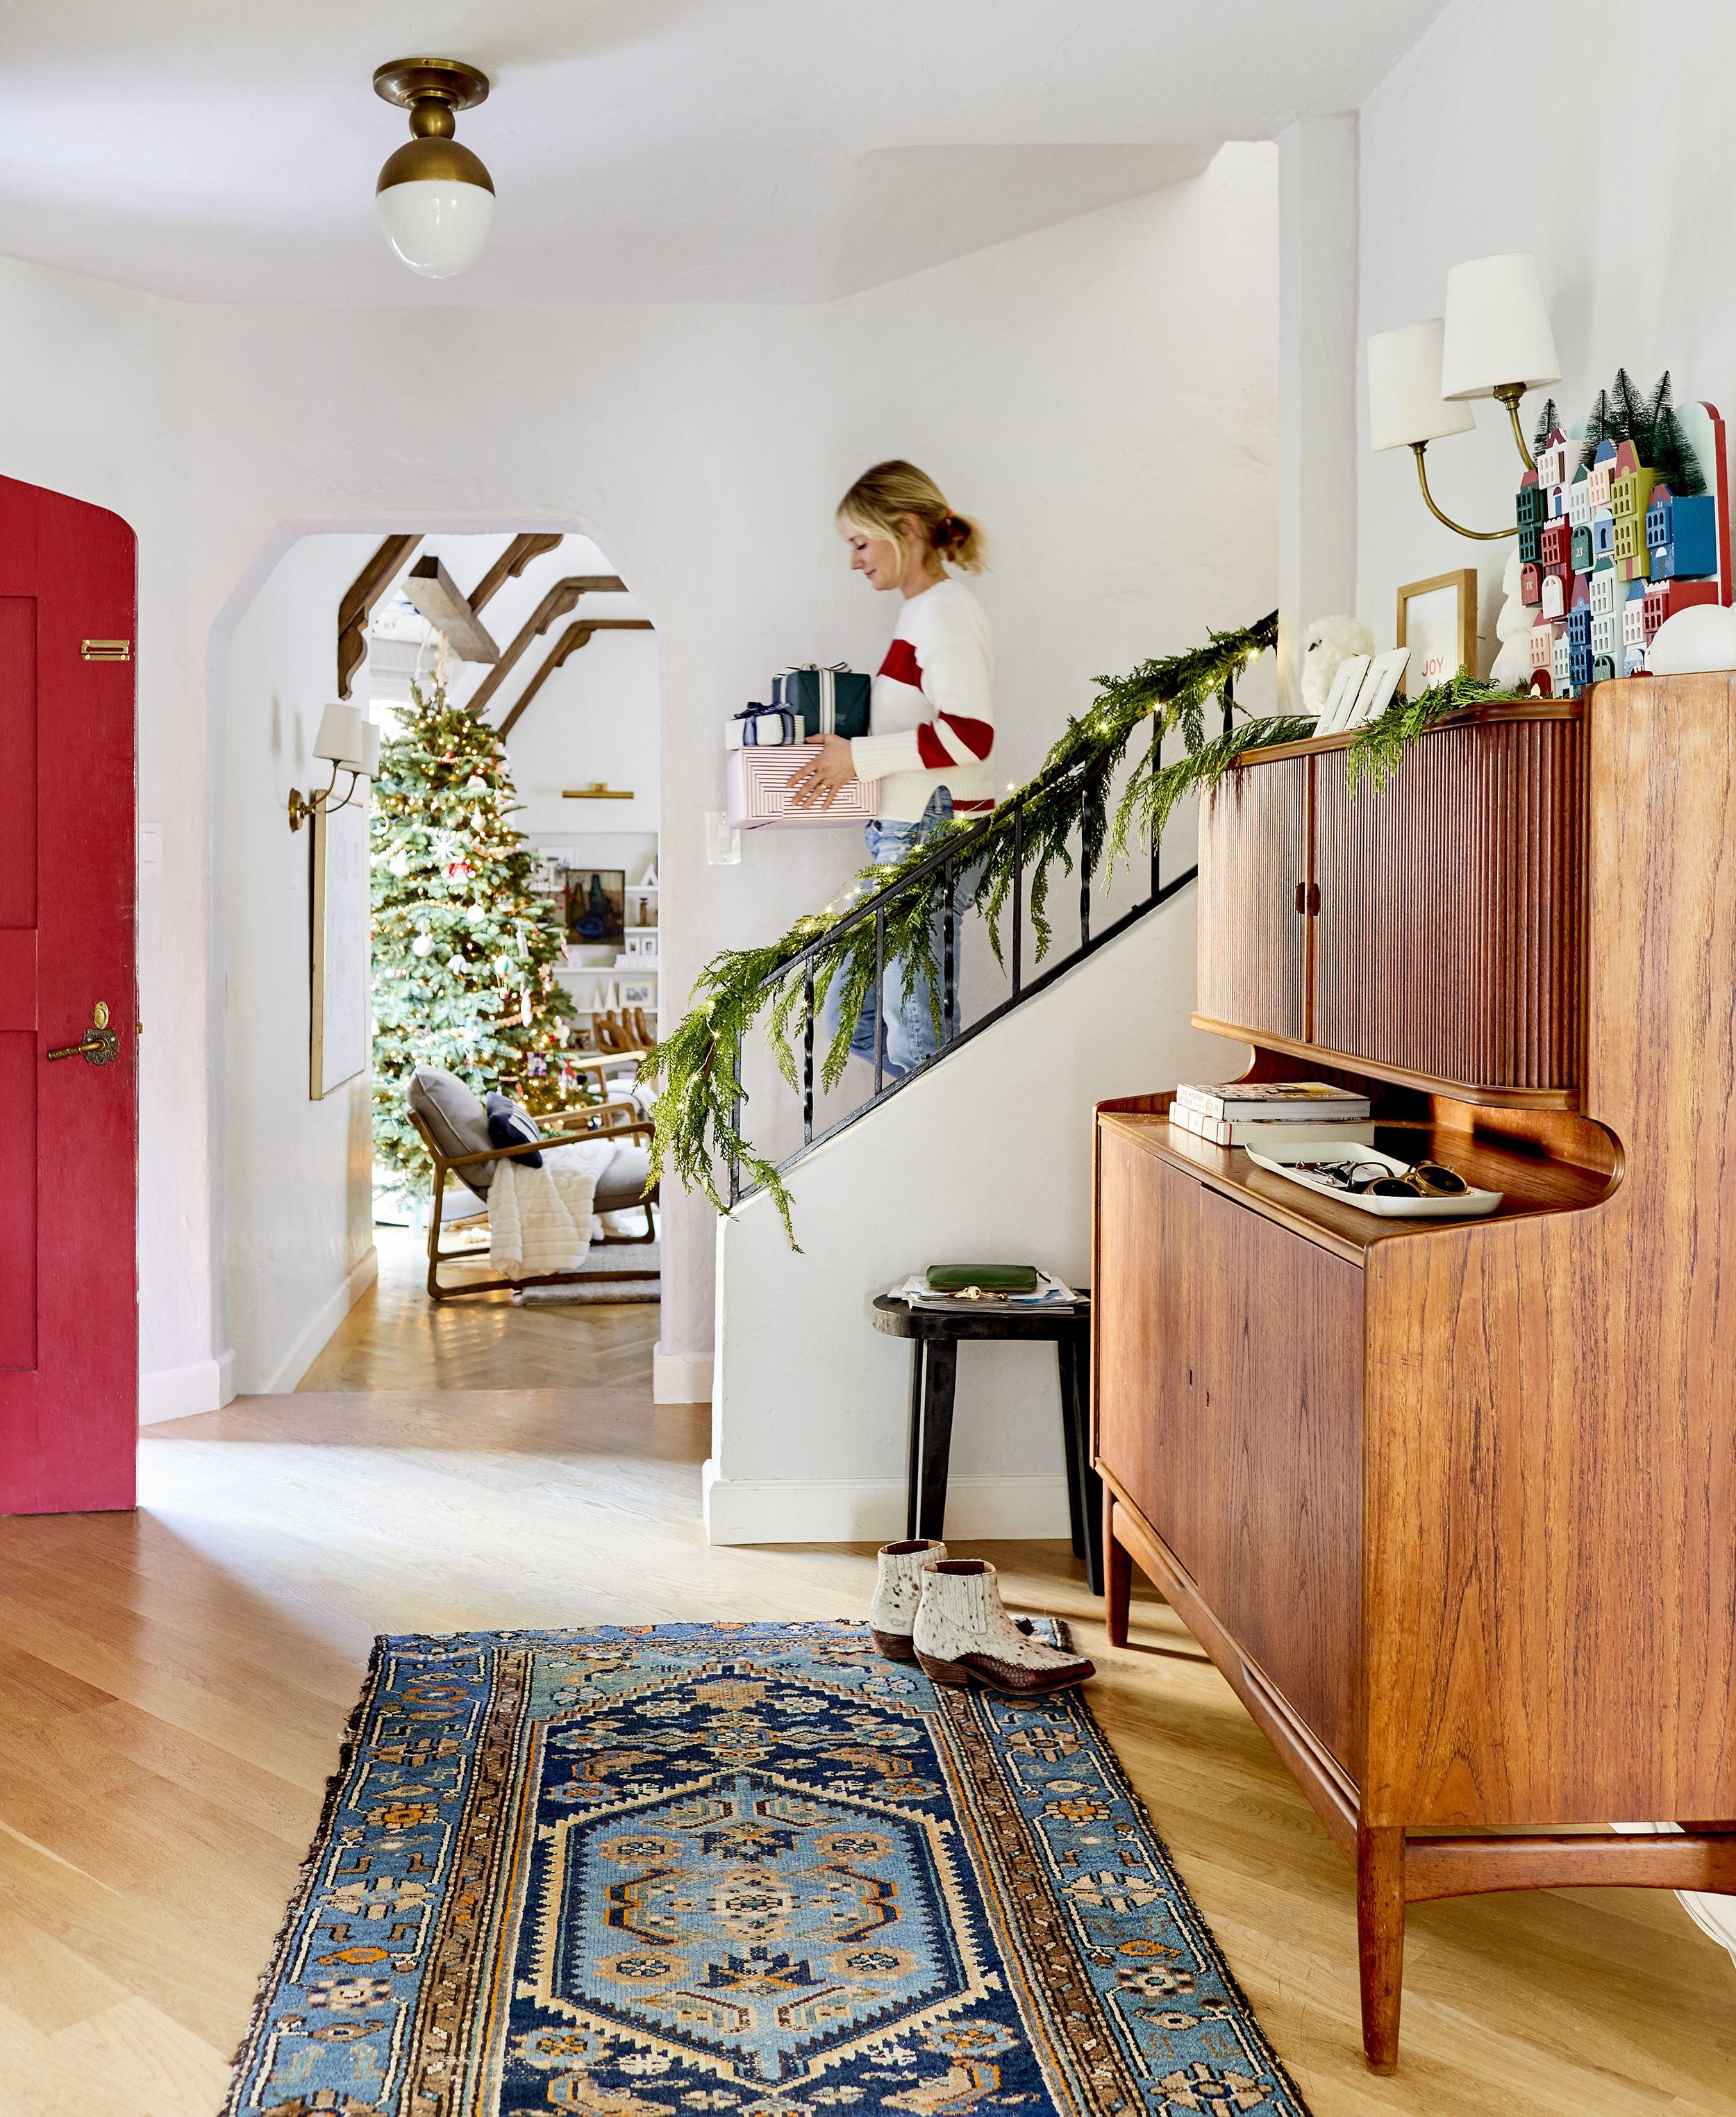 Hgtv Home Design Ideas: Holiday Decorating Hacks From HGTV Interior Designer Emily